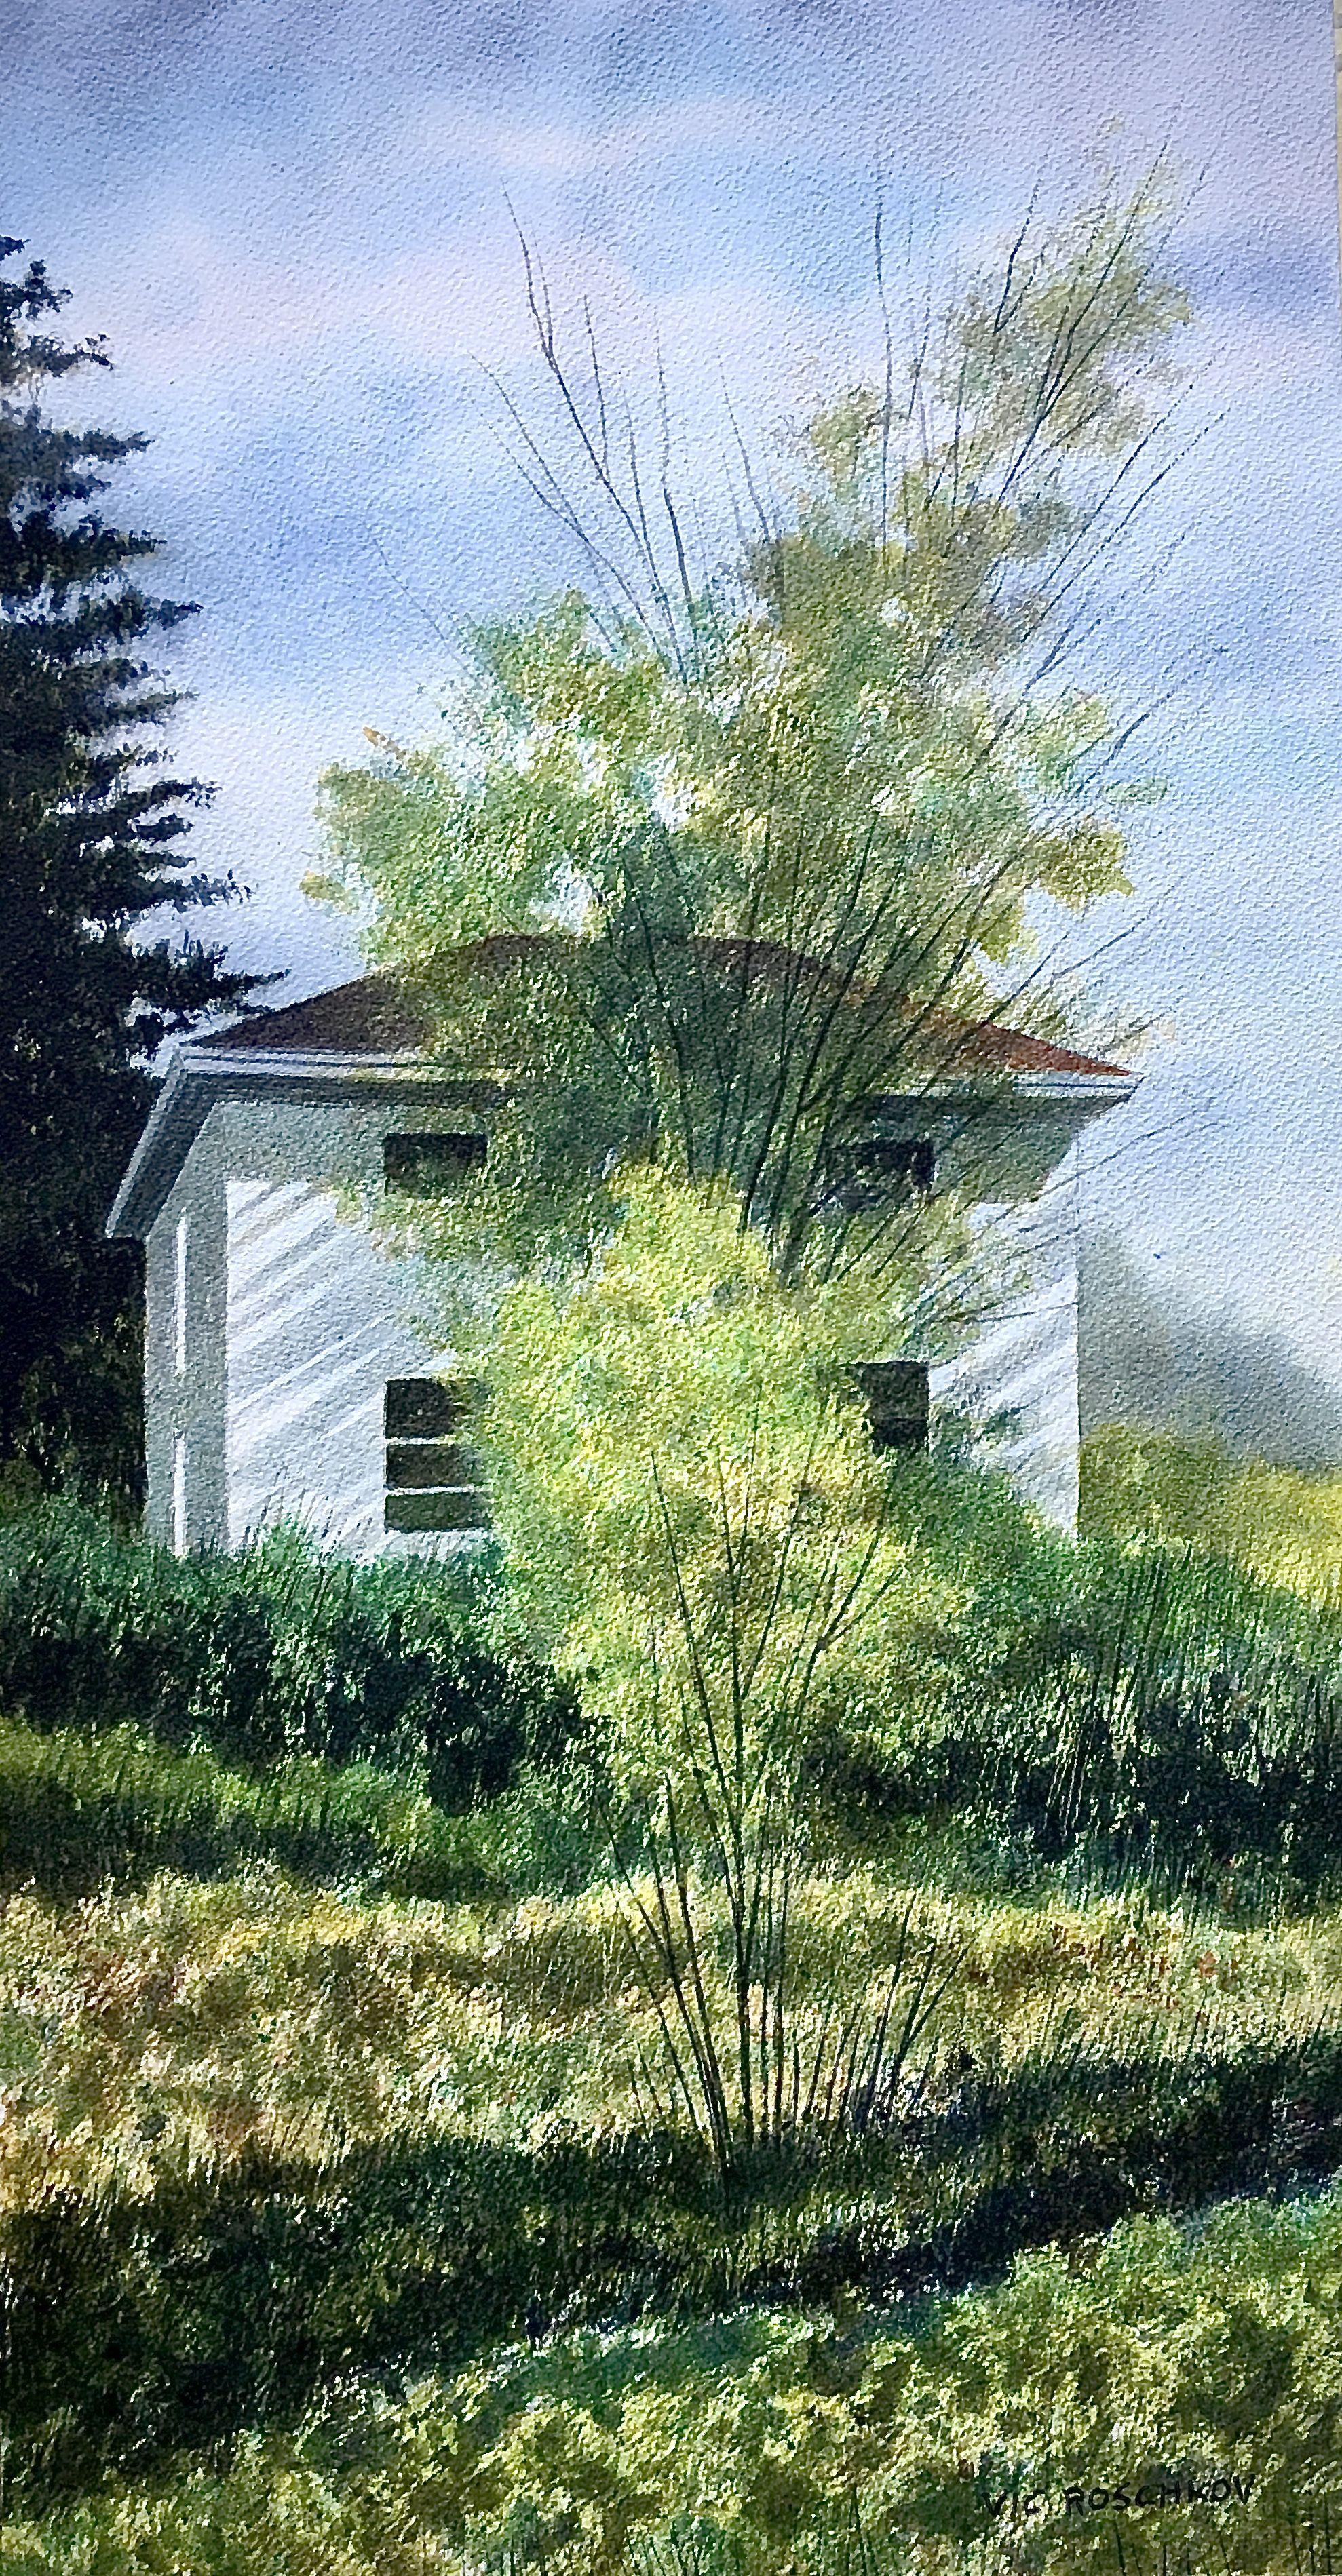 Mid Summer Hideaway, Painting, Watercolor on Watercolor Paper